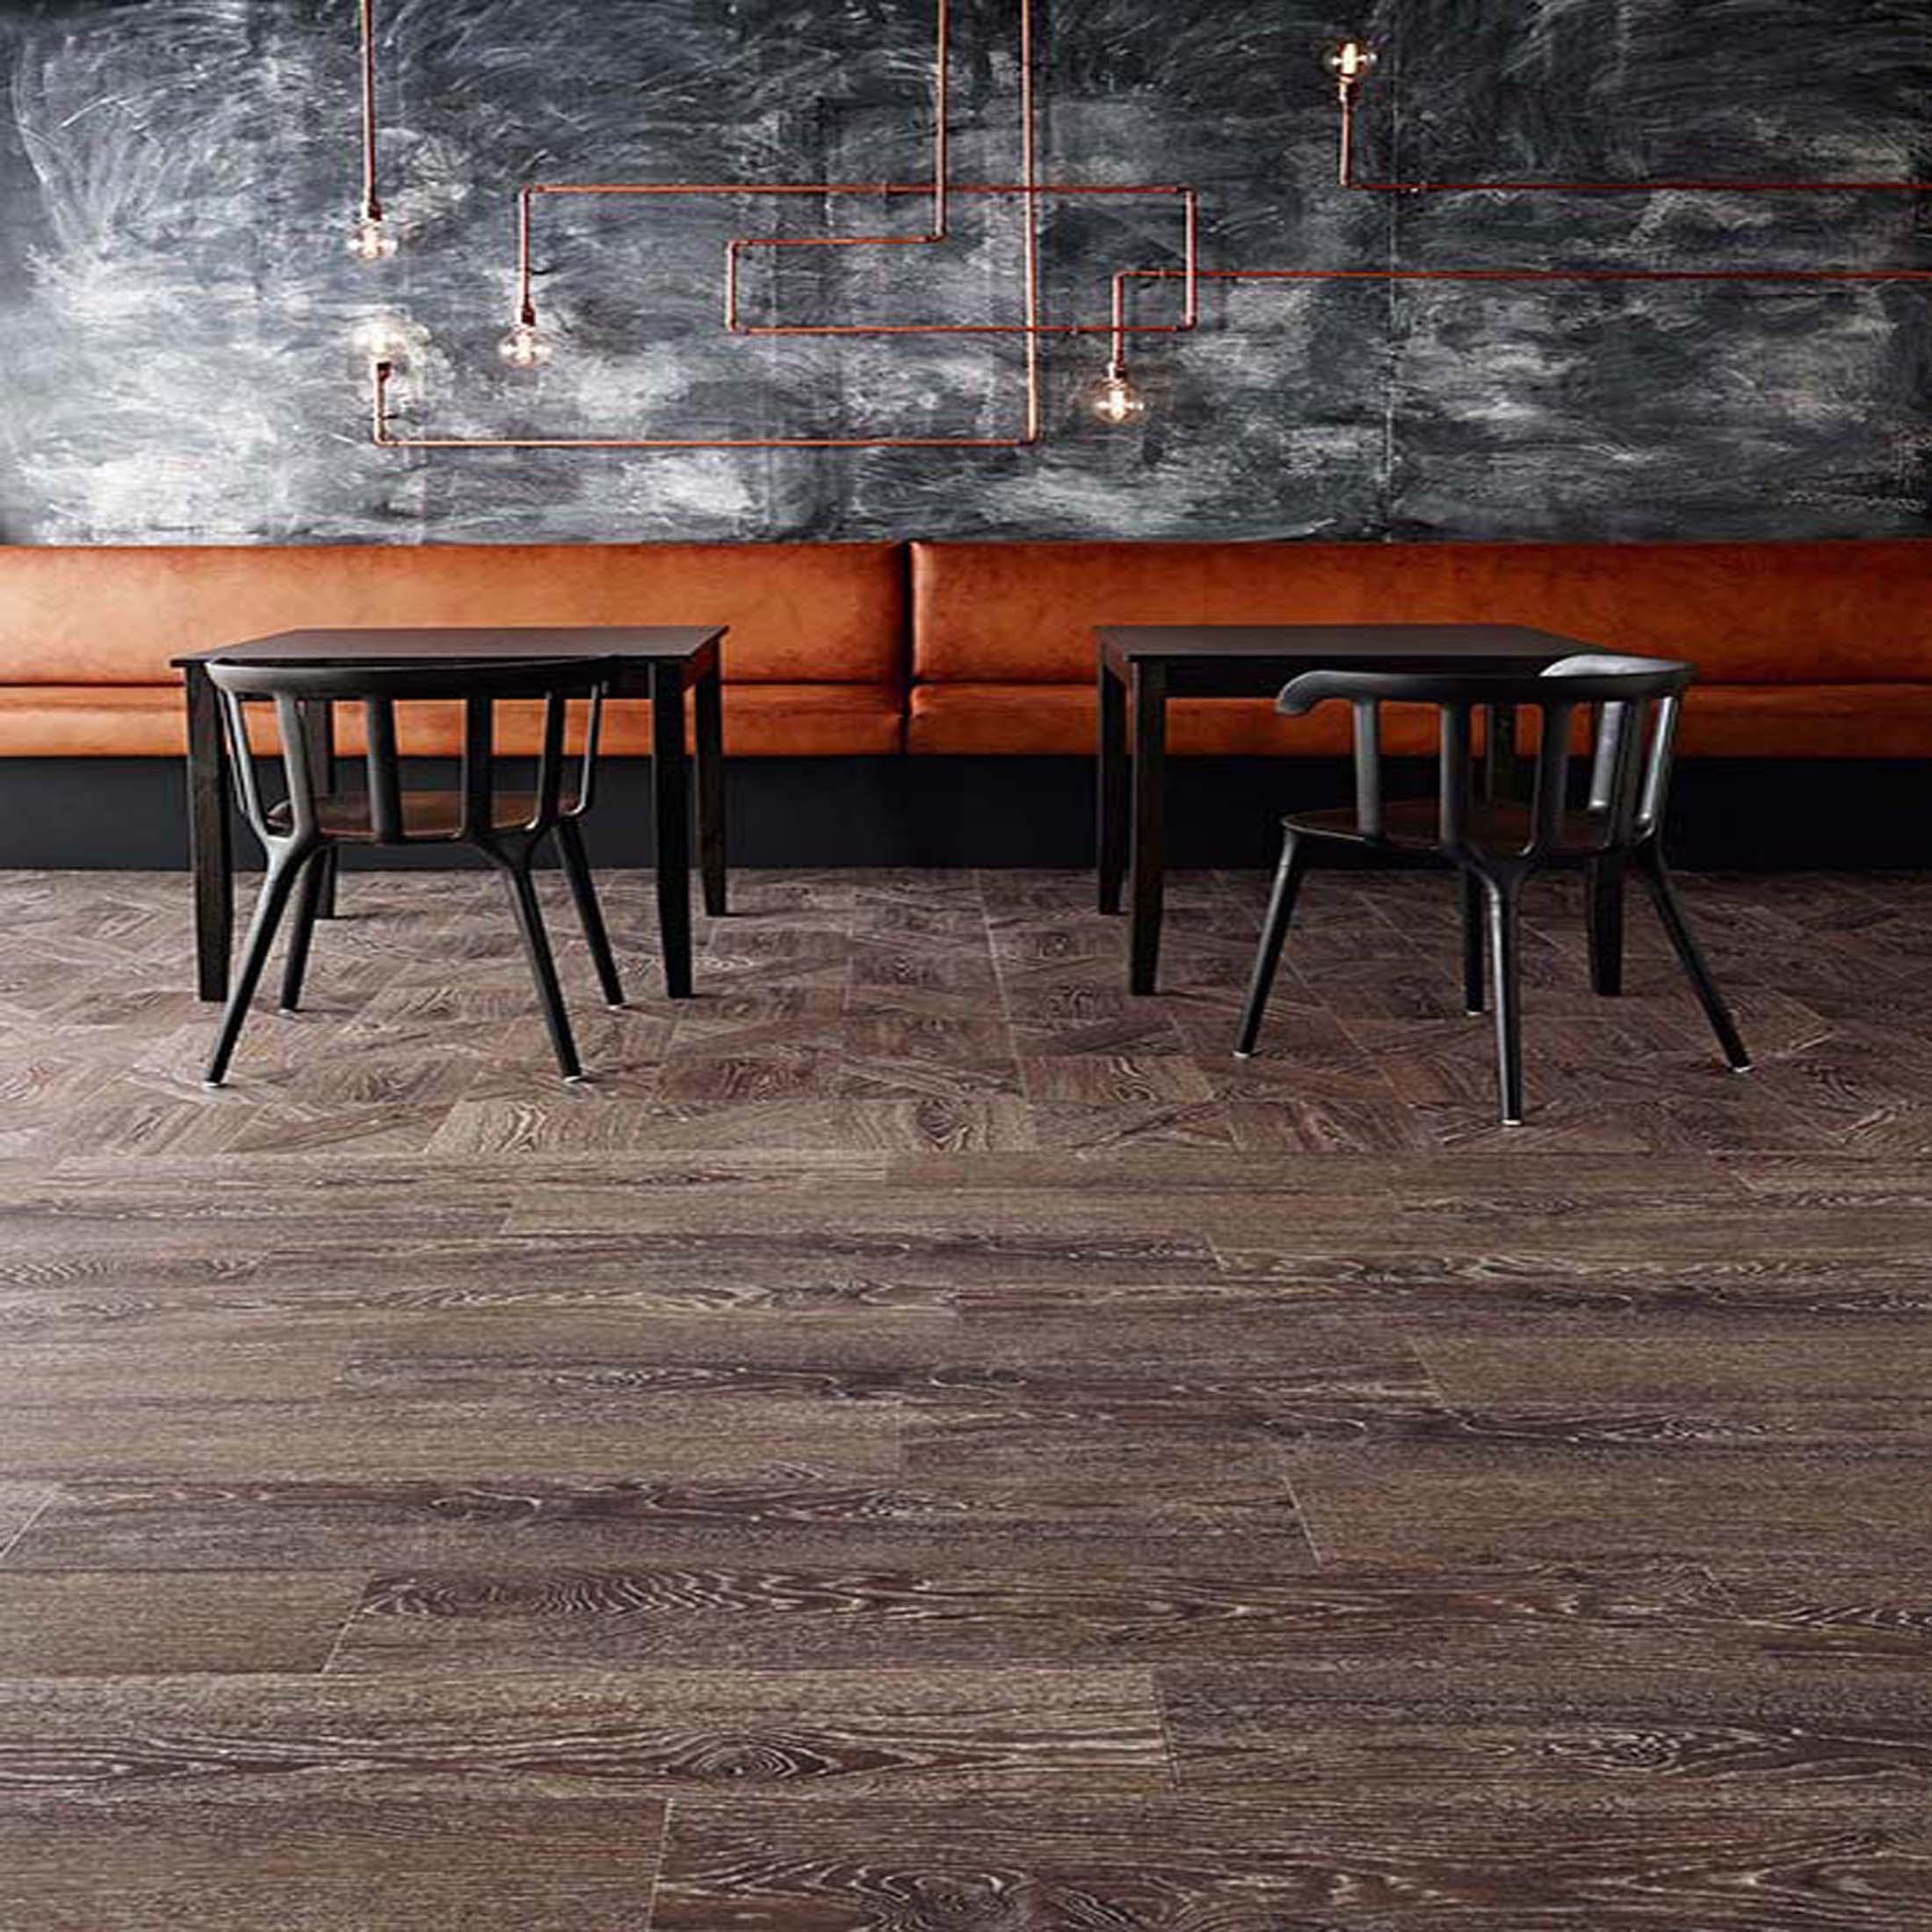 AR0W8130-Pilgrim-Oak-Stripwood-Woven-Cafe-C-Sept-15-CMYK - Copy